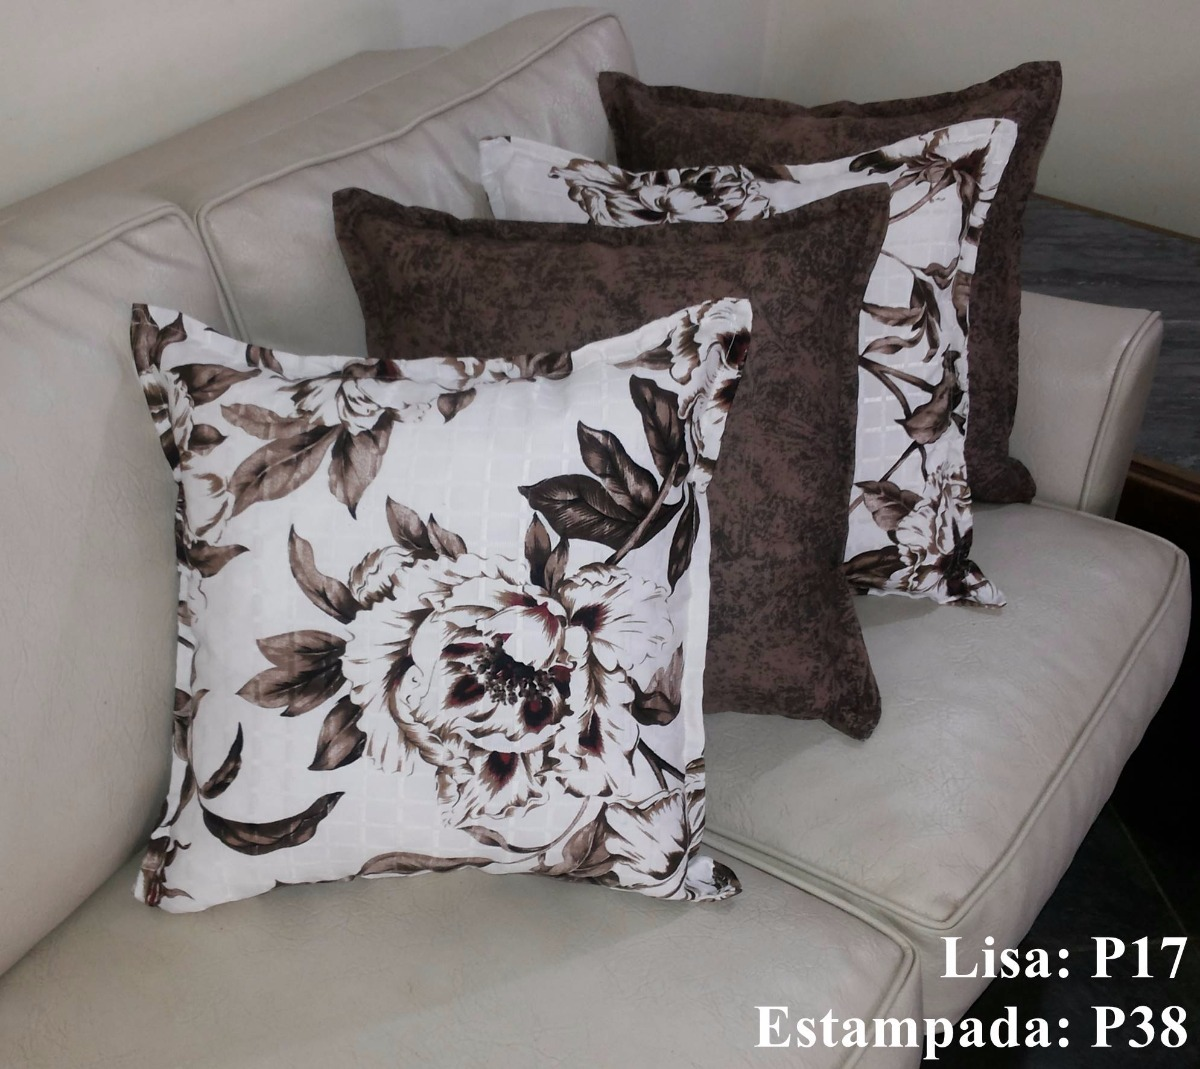 ba5d65c10 Almofada Decorativa - 12 Capas + 12 Enchimentos Fibra 50x50 - R  199 ...